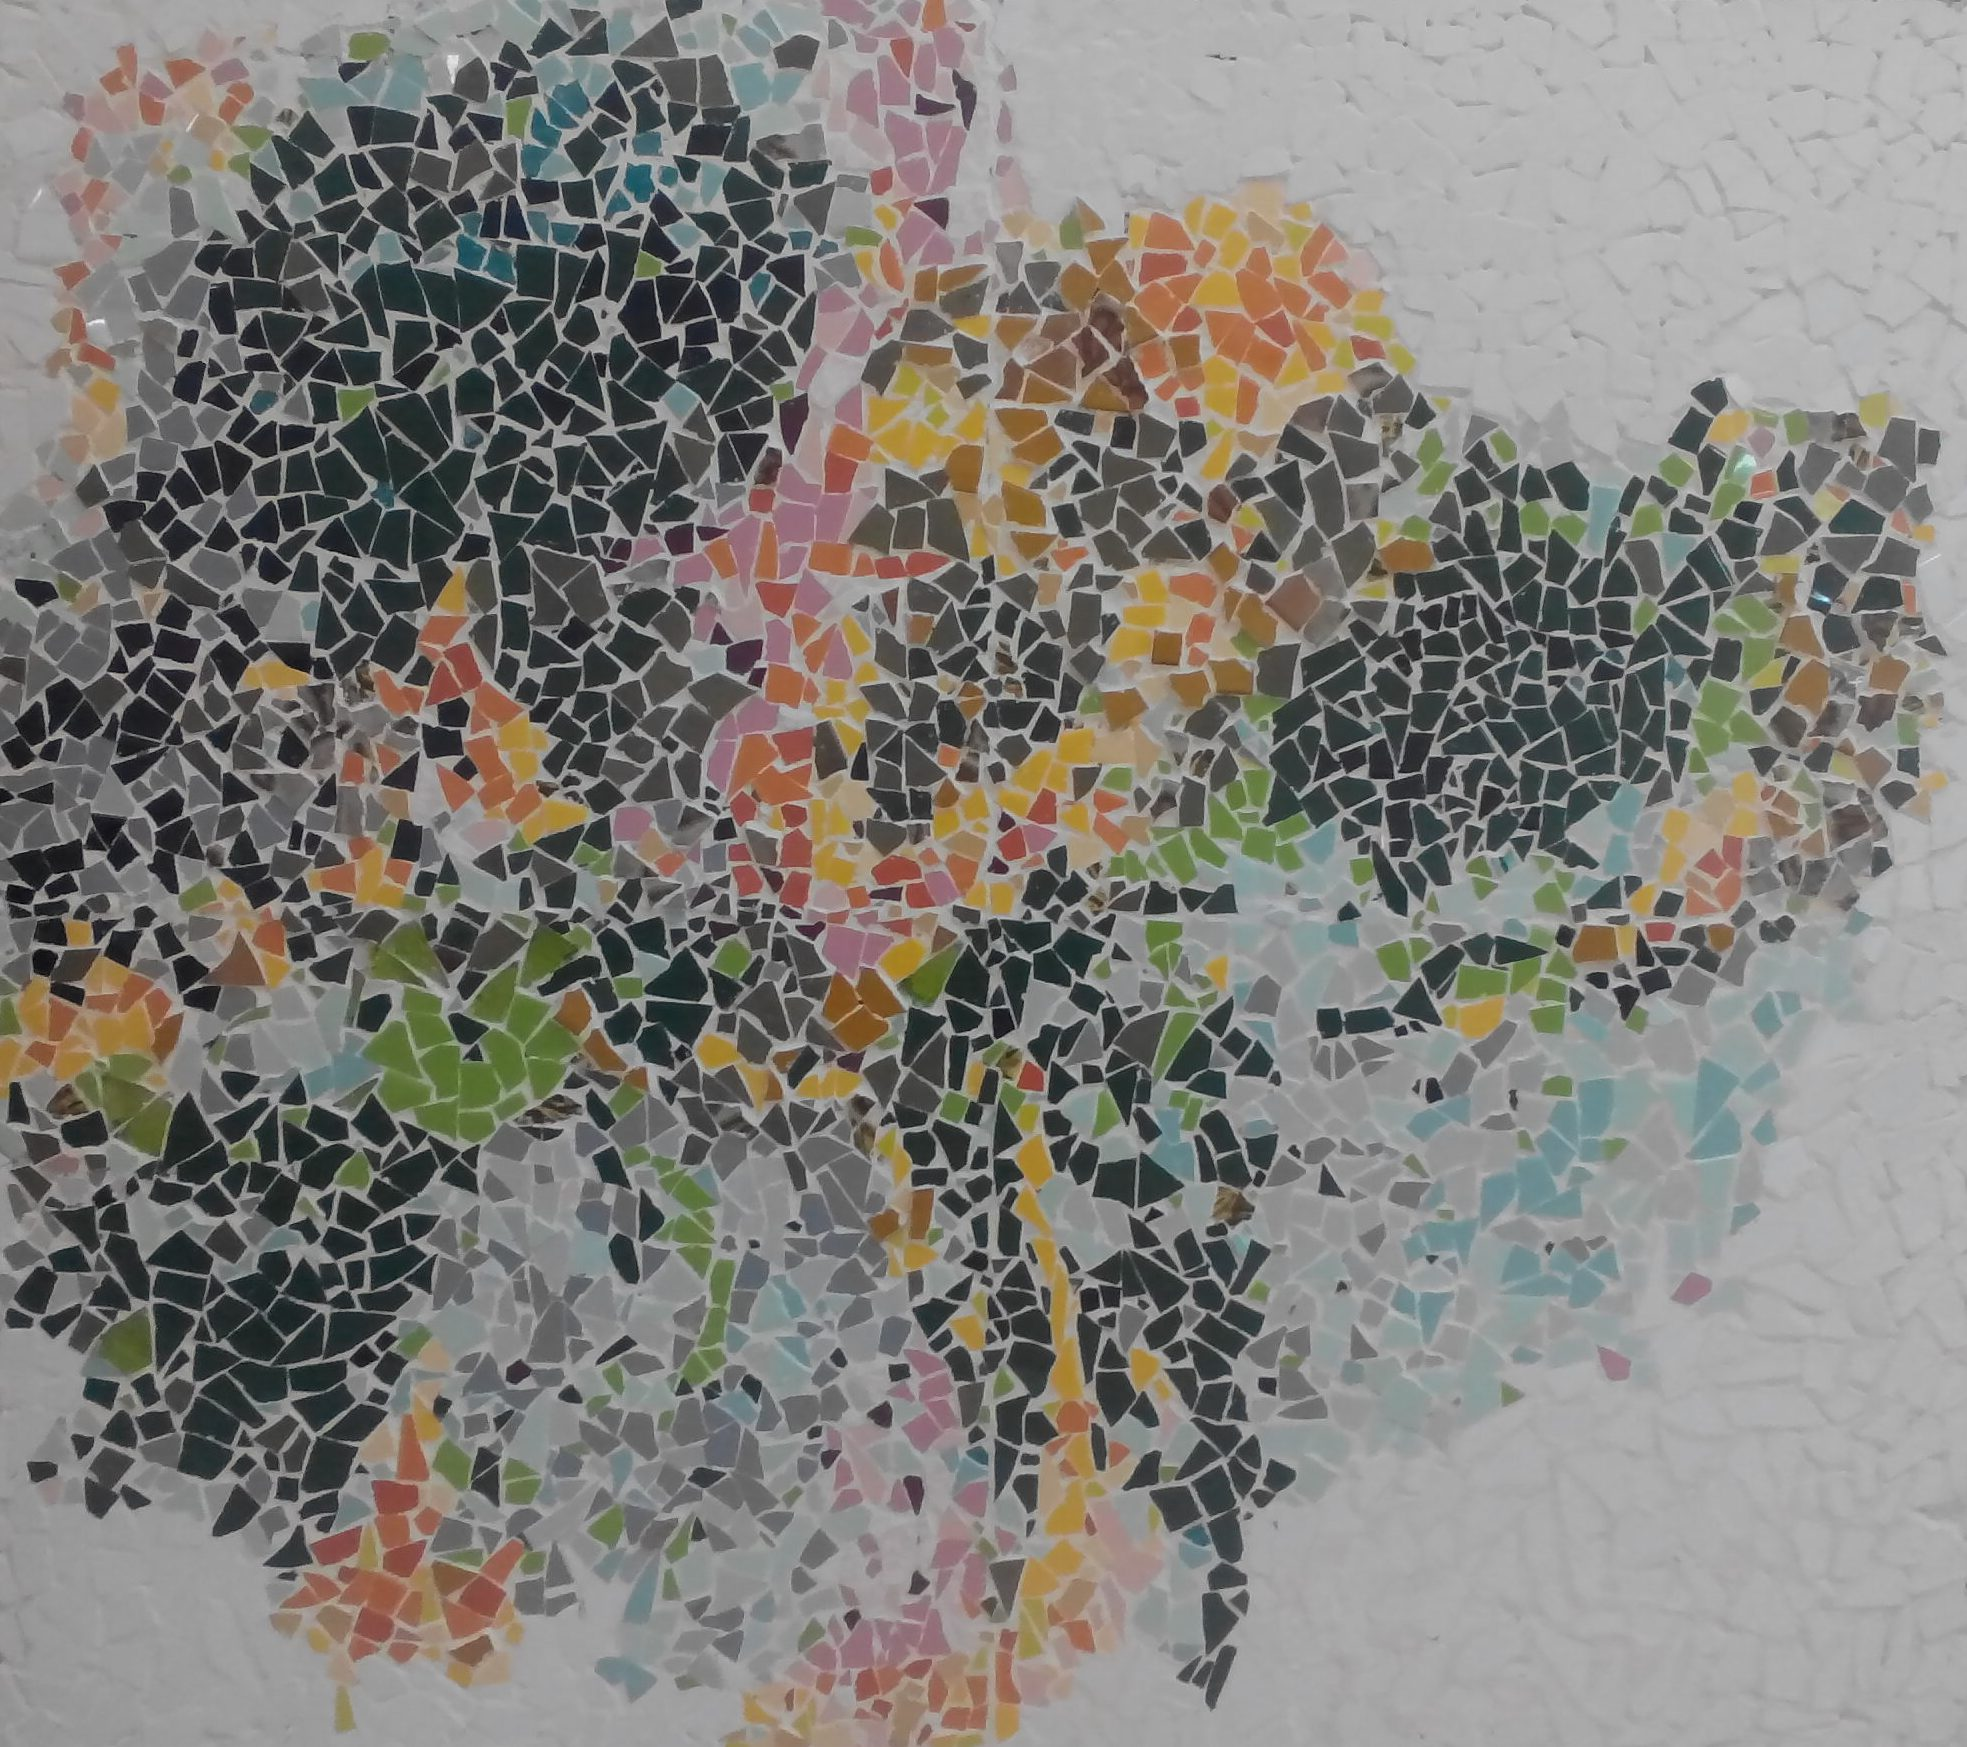 Ecologia y paisaje urbano